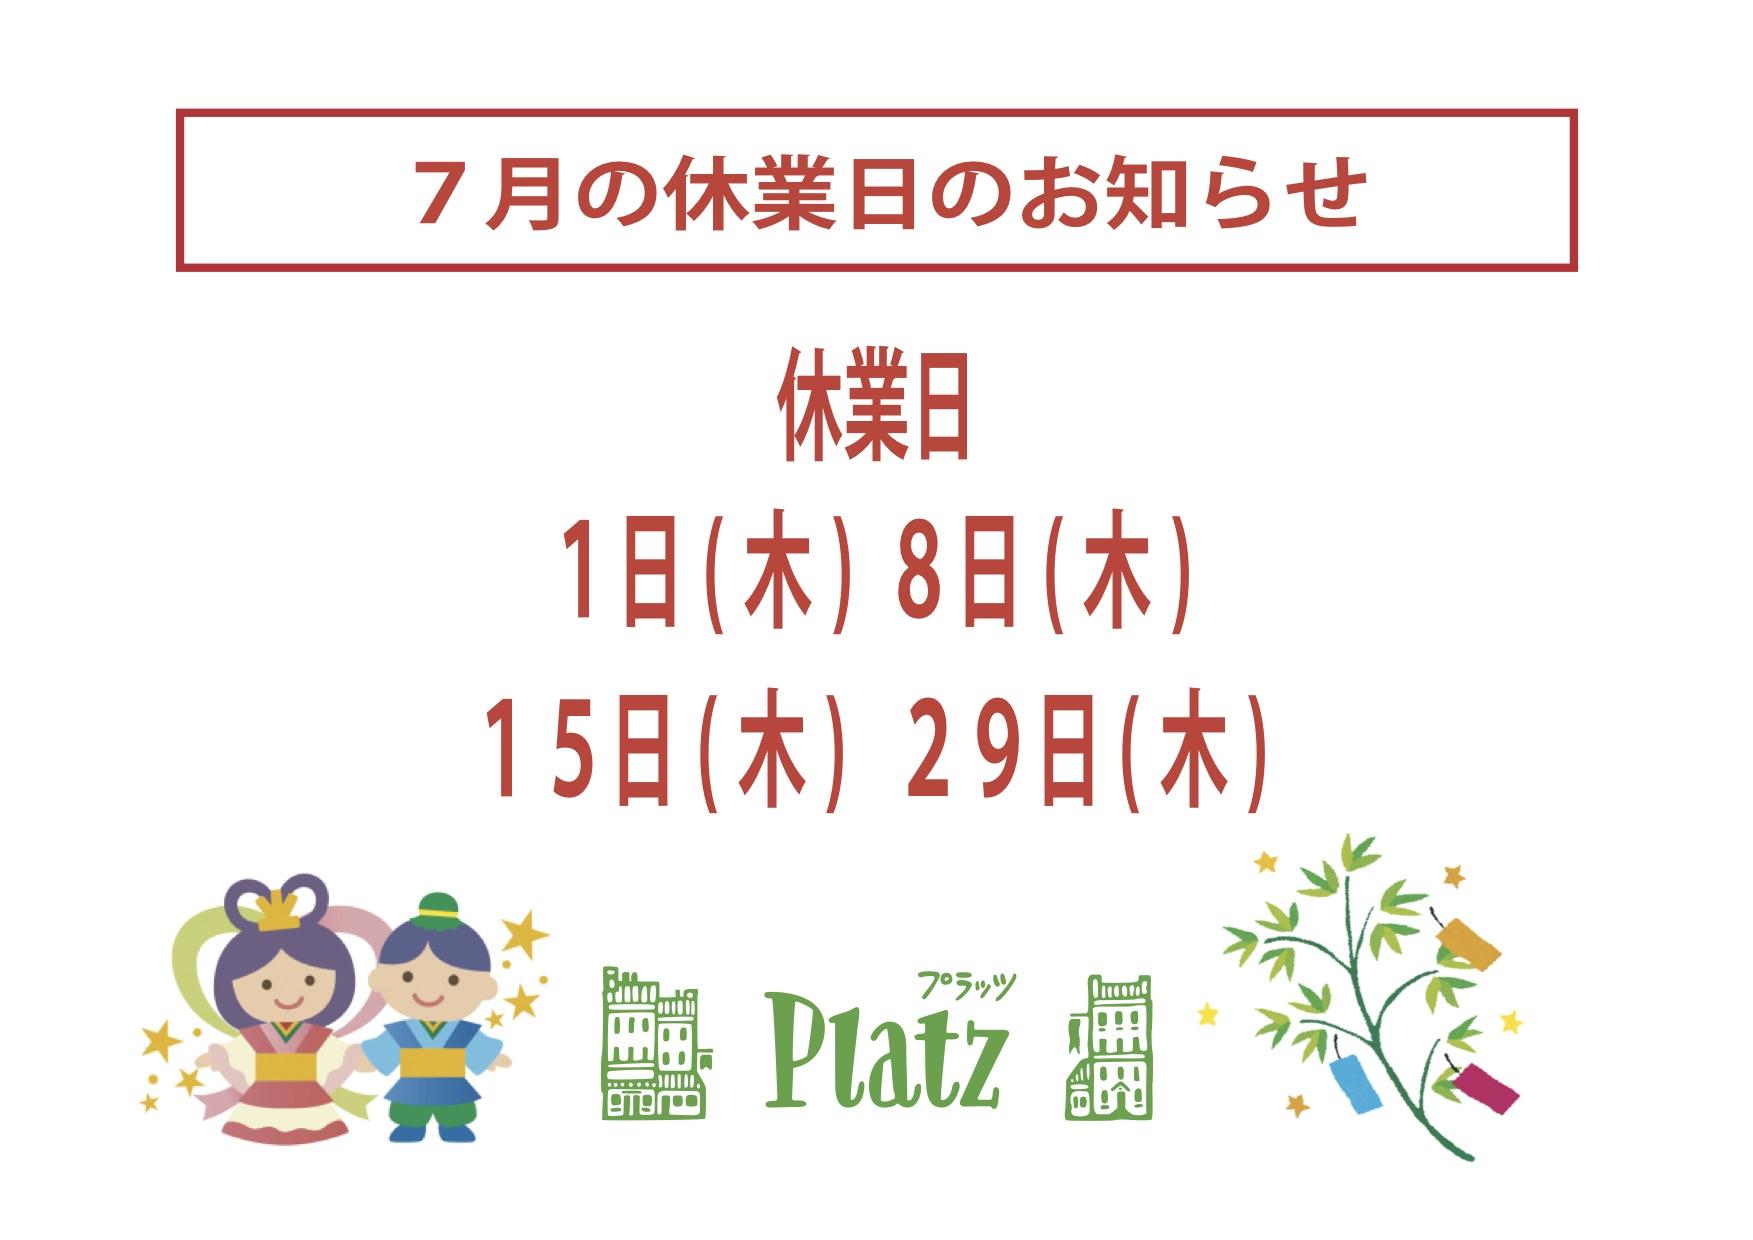 http://www.kyoto-platz.jp/news/images/2021.%EF%BC%97%E6%9C%88%E4%BC%91%E6%A5%AD%E6%97%A5.jpg